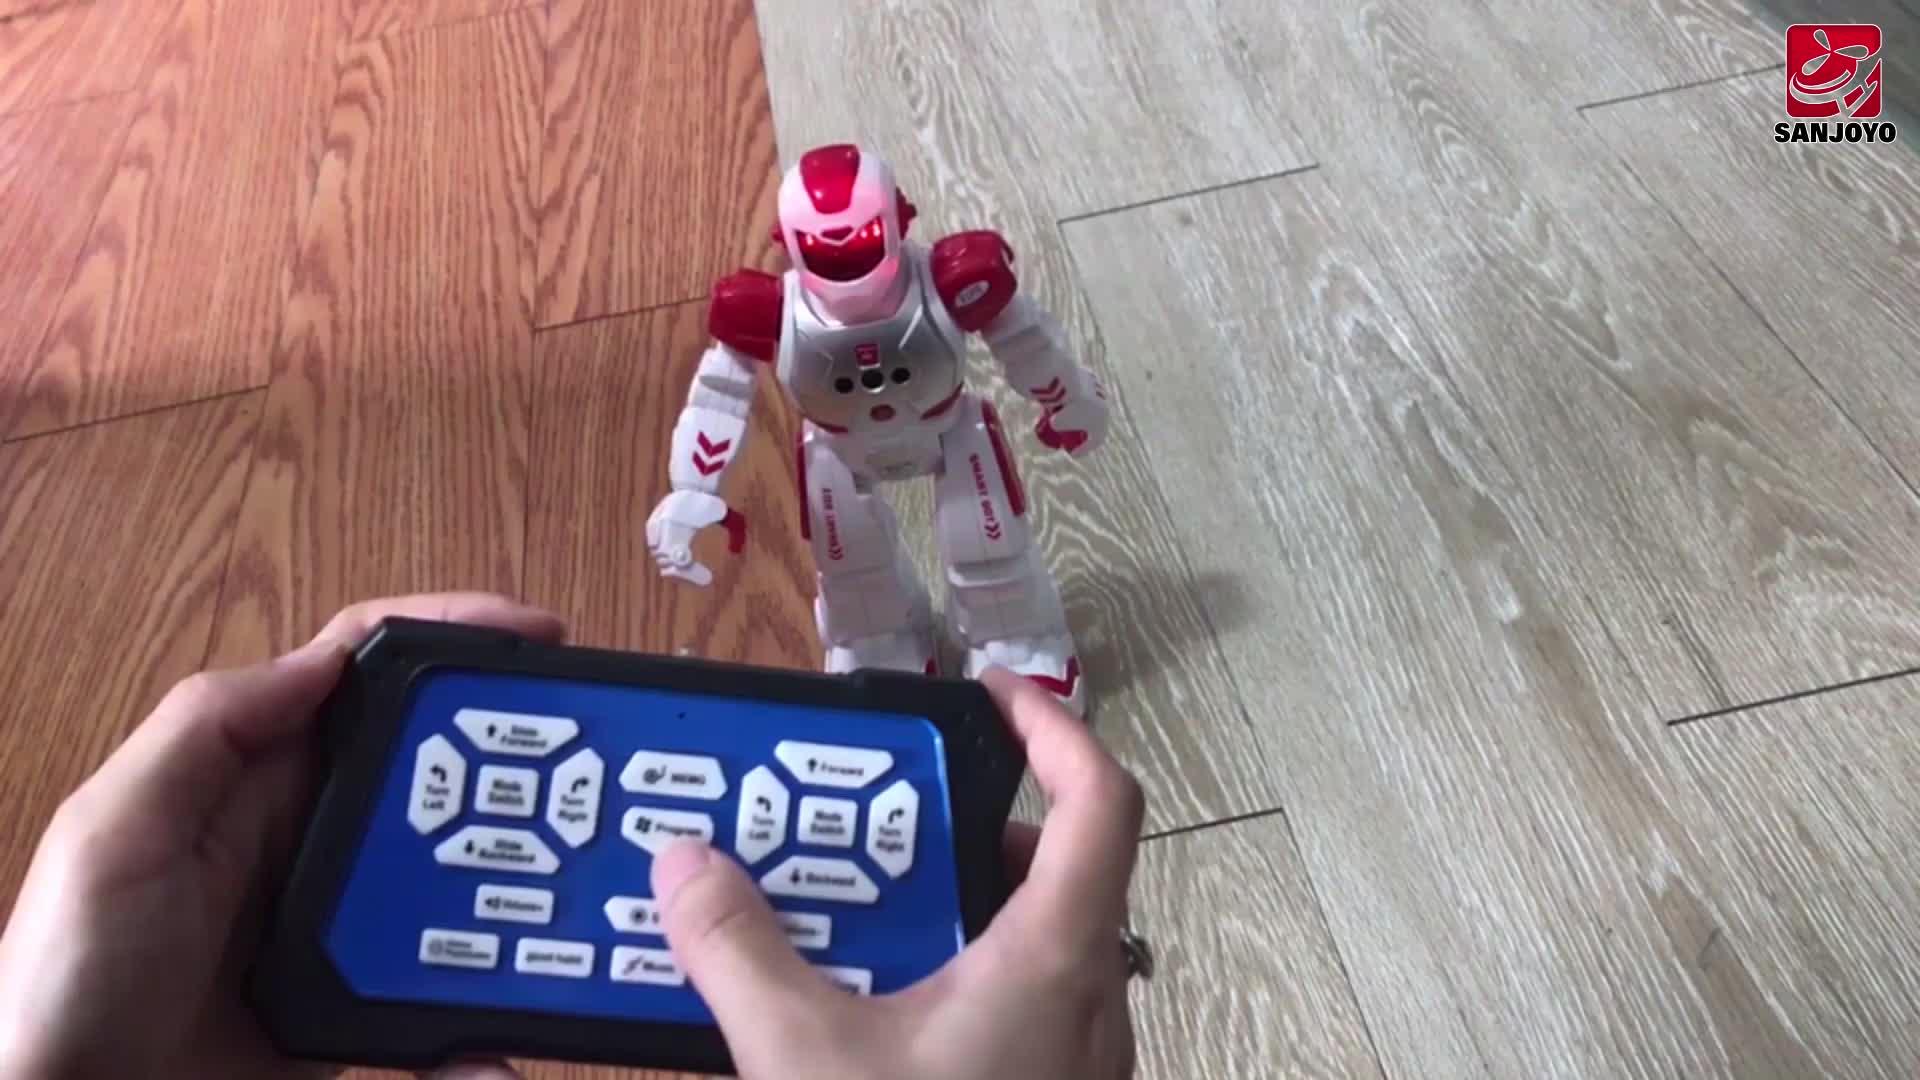 Professionele fabriek levering lage kosten elektronische gesture control walking dans intelligente robot SKY-822